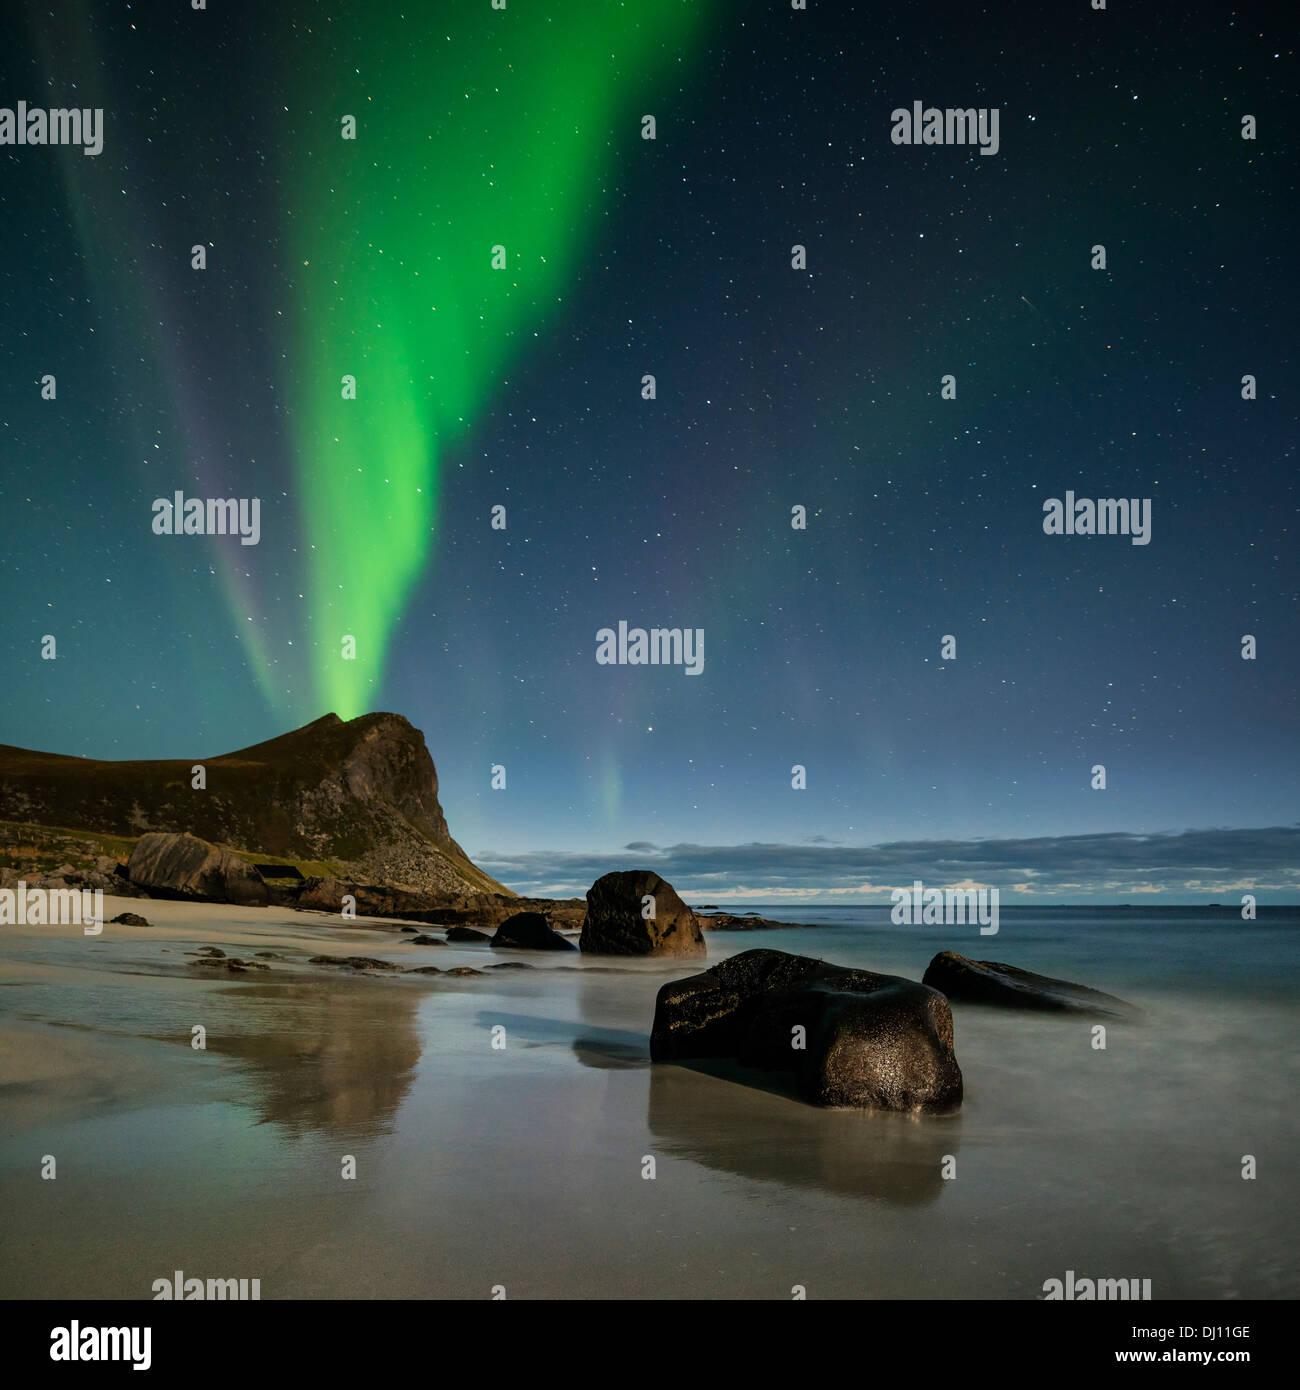 Northern Lights füllen Himmel über Myrland Beach, Flakstadoy, Lofoten Inseln, Norwegen Stockbild